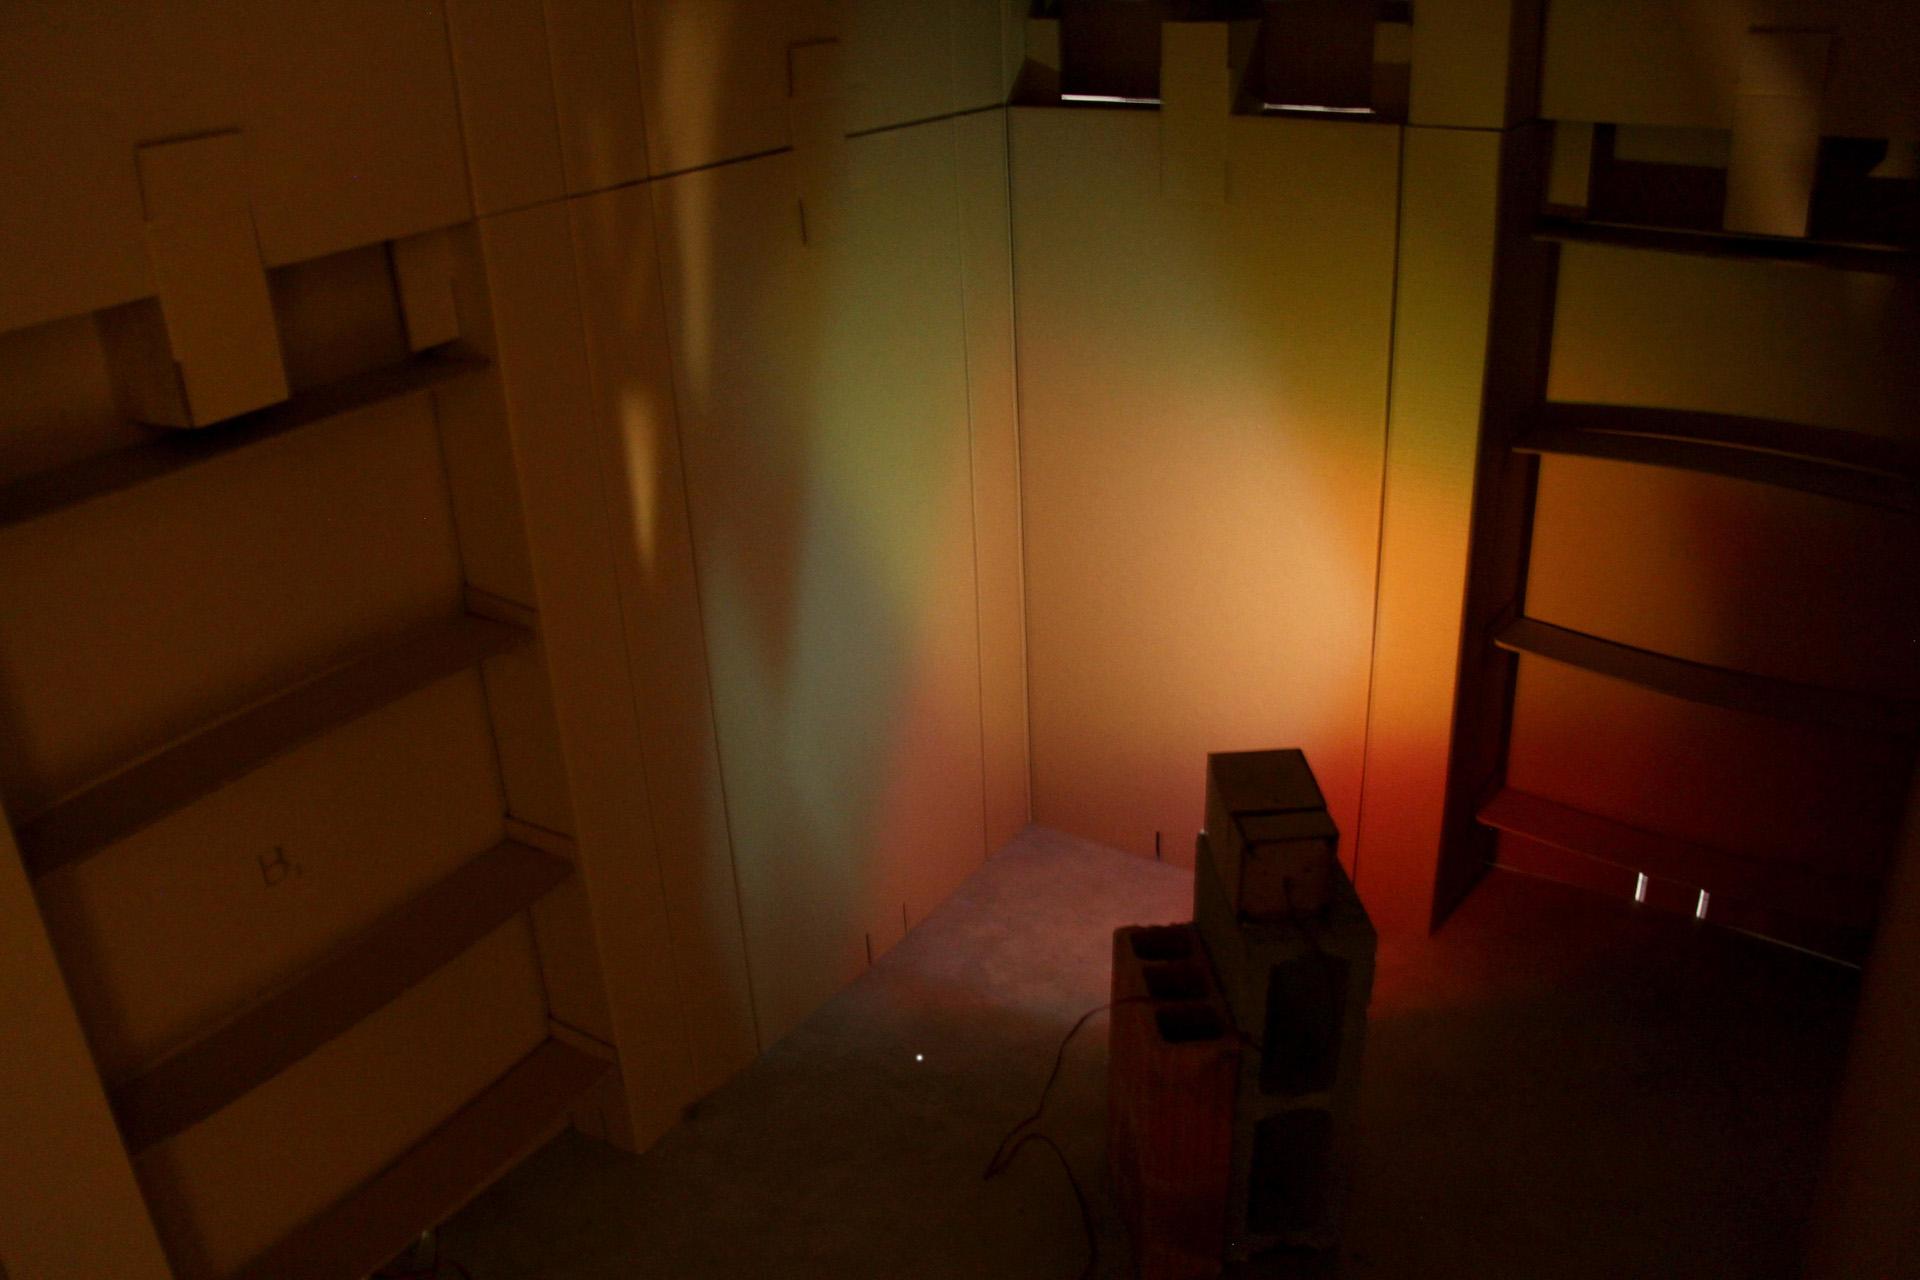 imagen real penetrable sculpture interior